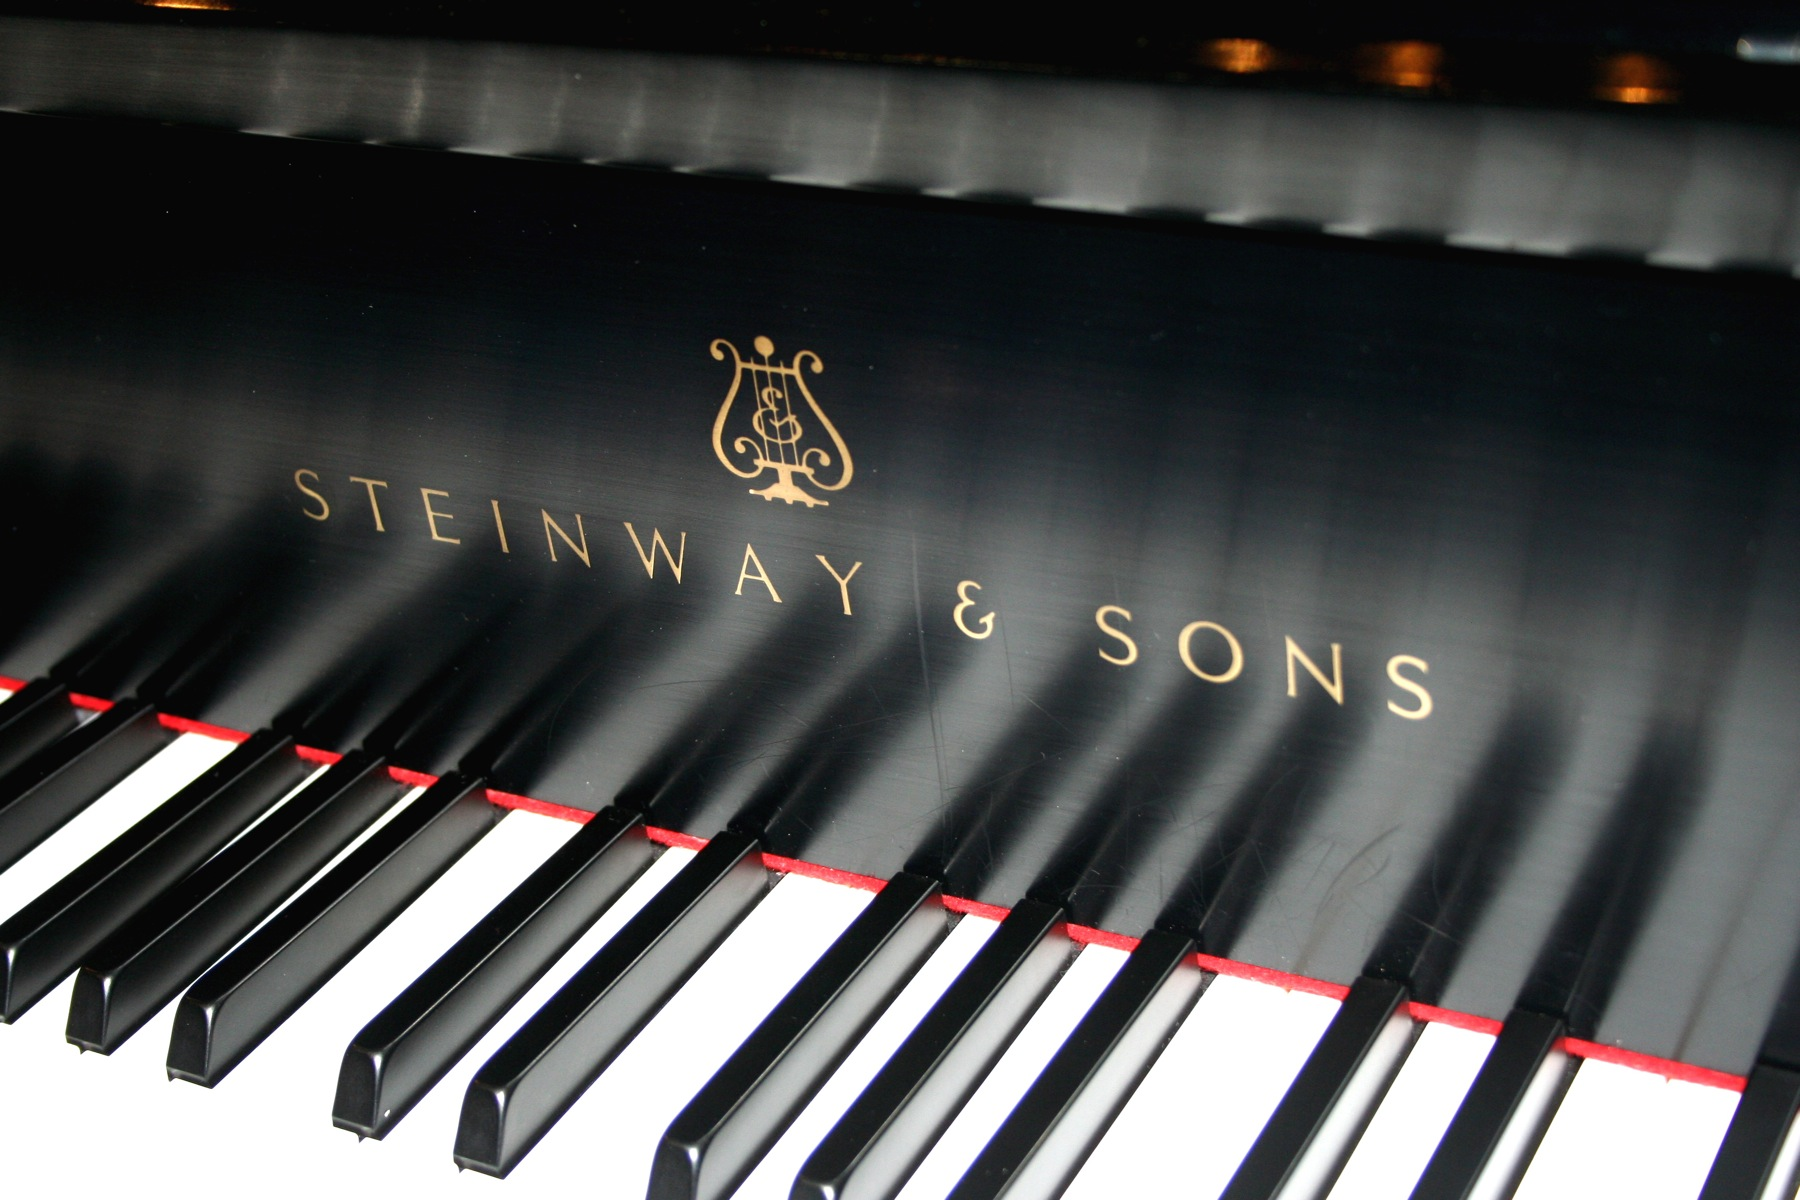 Steinway sons piano wallpaper Wallpaper Wide HD 1800x1200